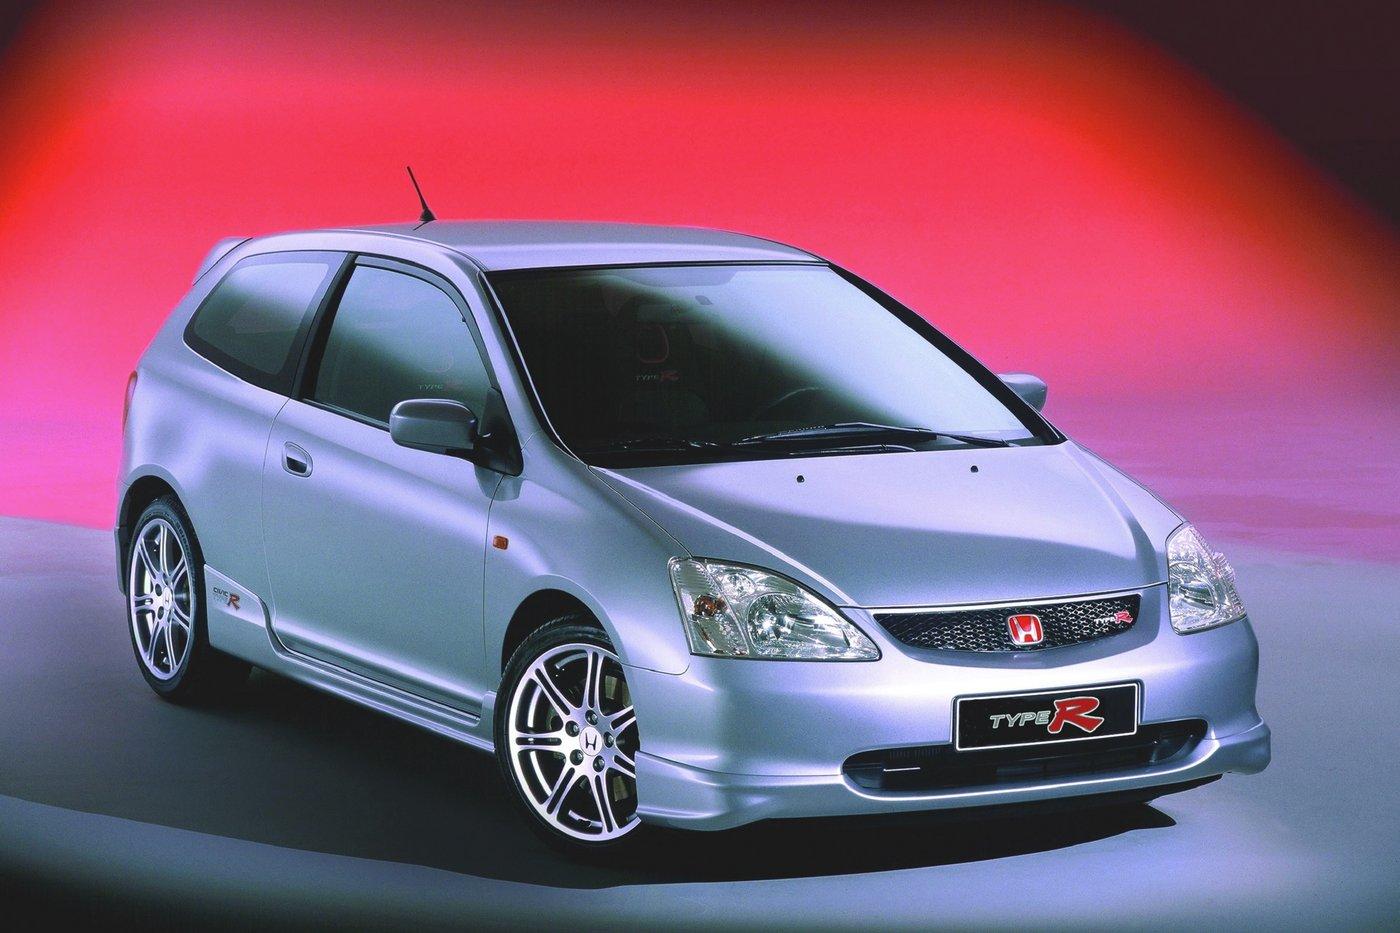 [Imagen: Honda-civic-type-r-62.jpg]